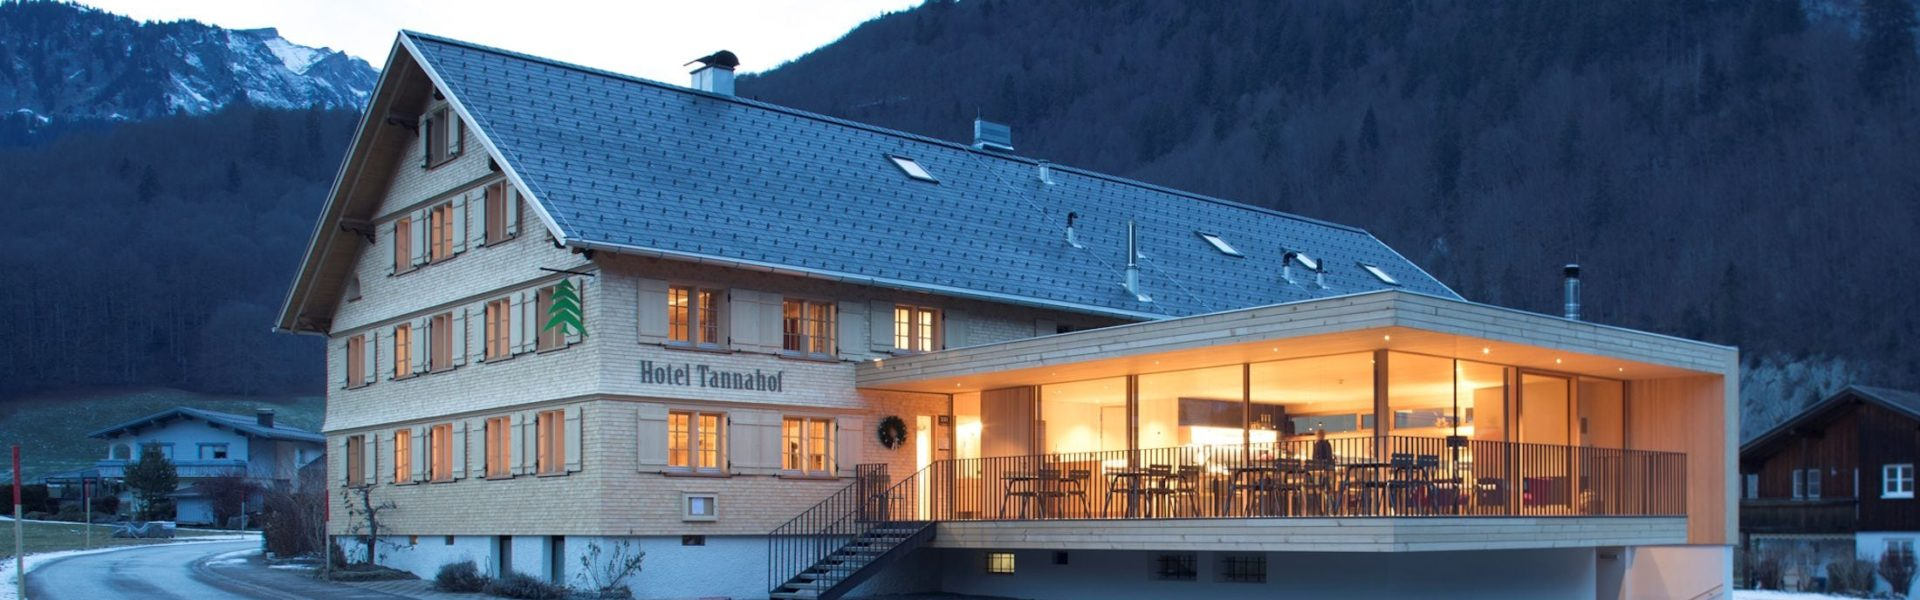 Hotel Tannahof, Au, (c) Angela Lamprecht